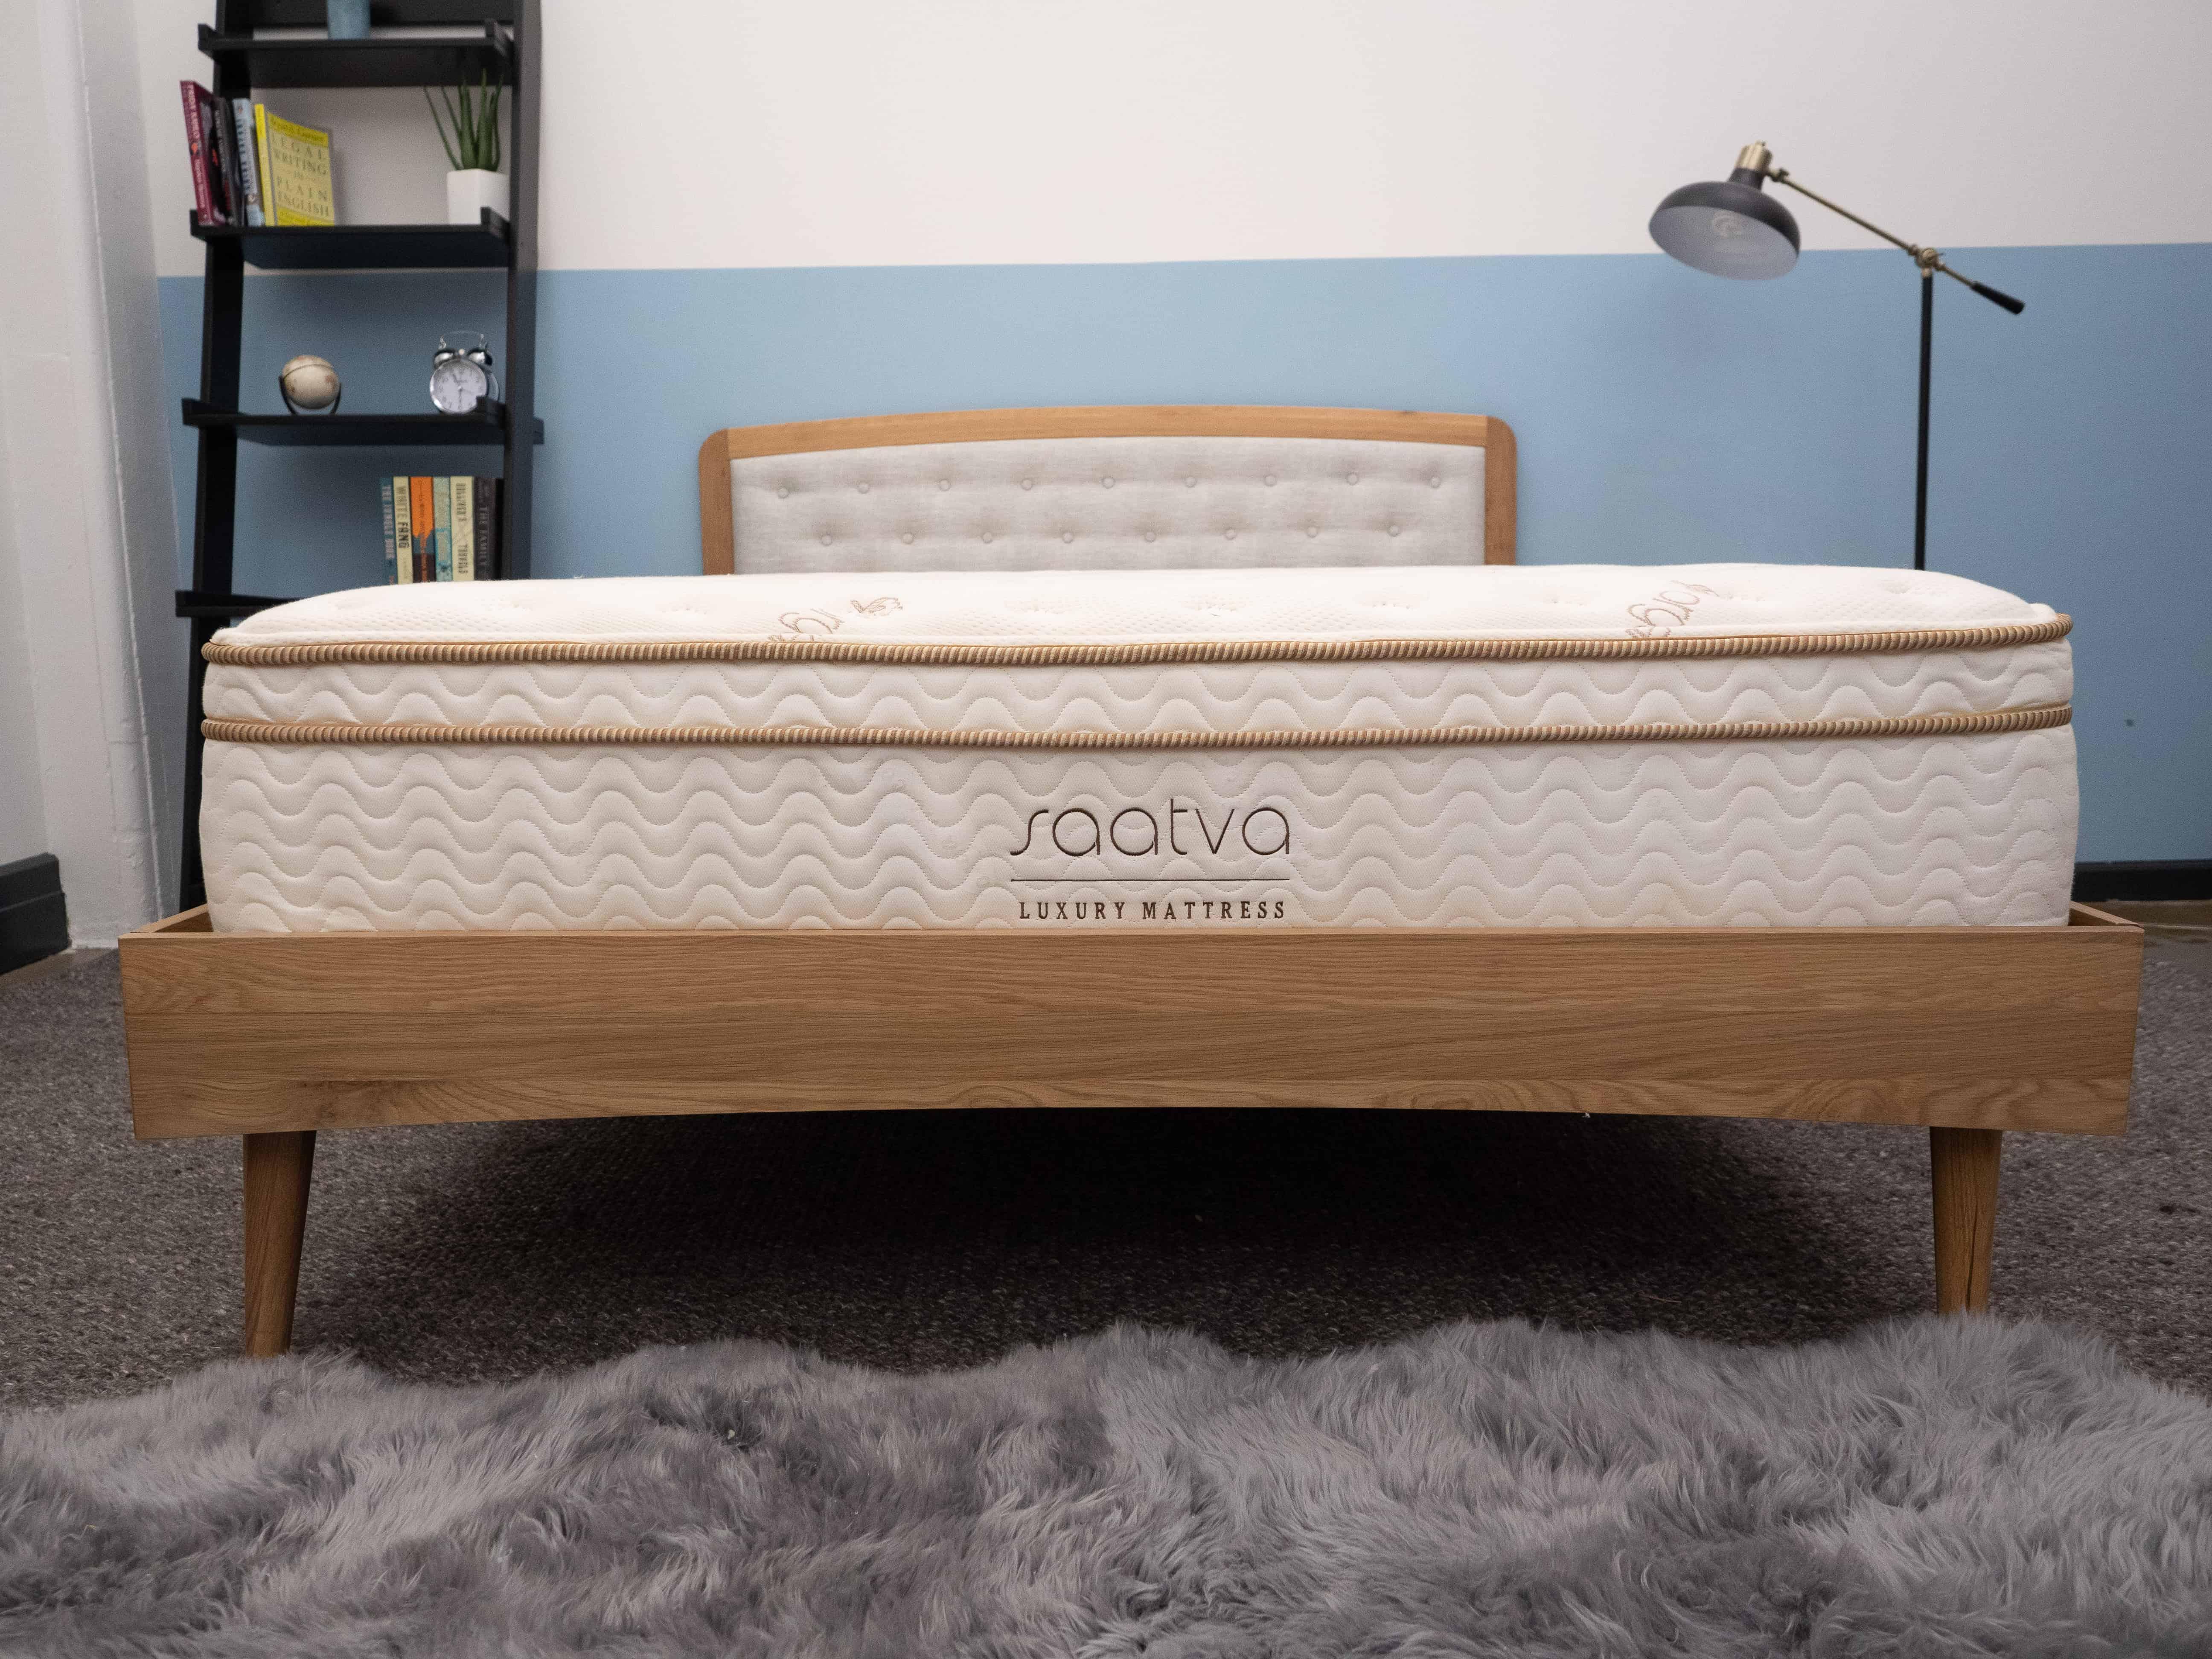 Saatva-Front Best Mattress for Side Sleepers